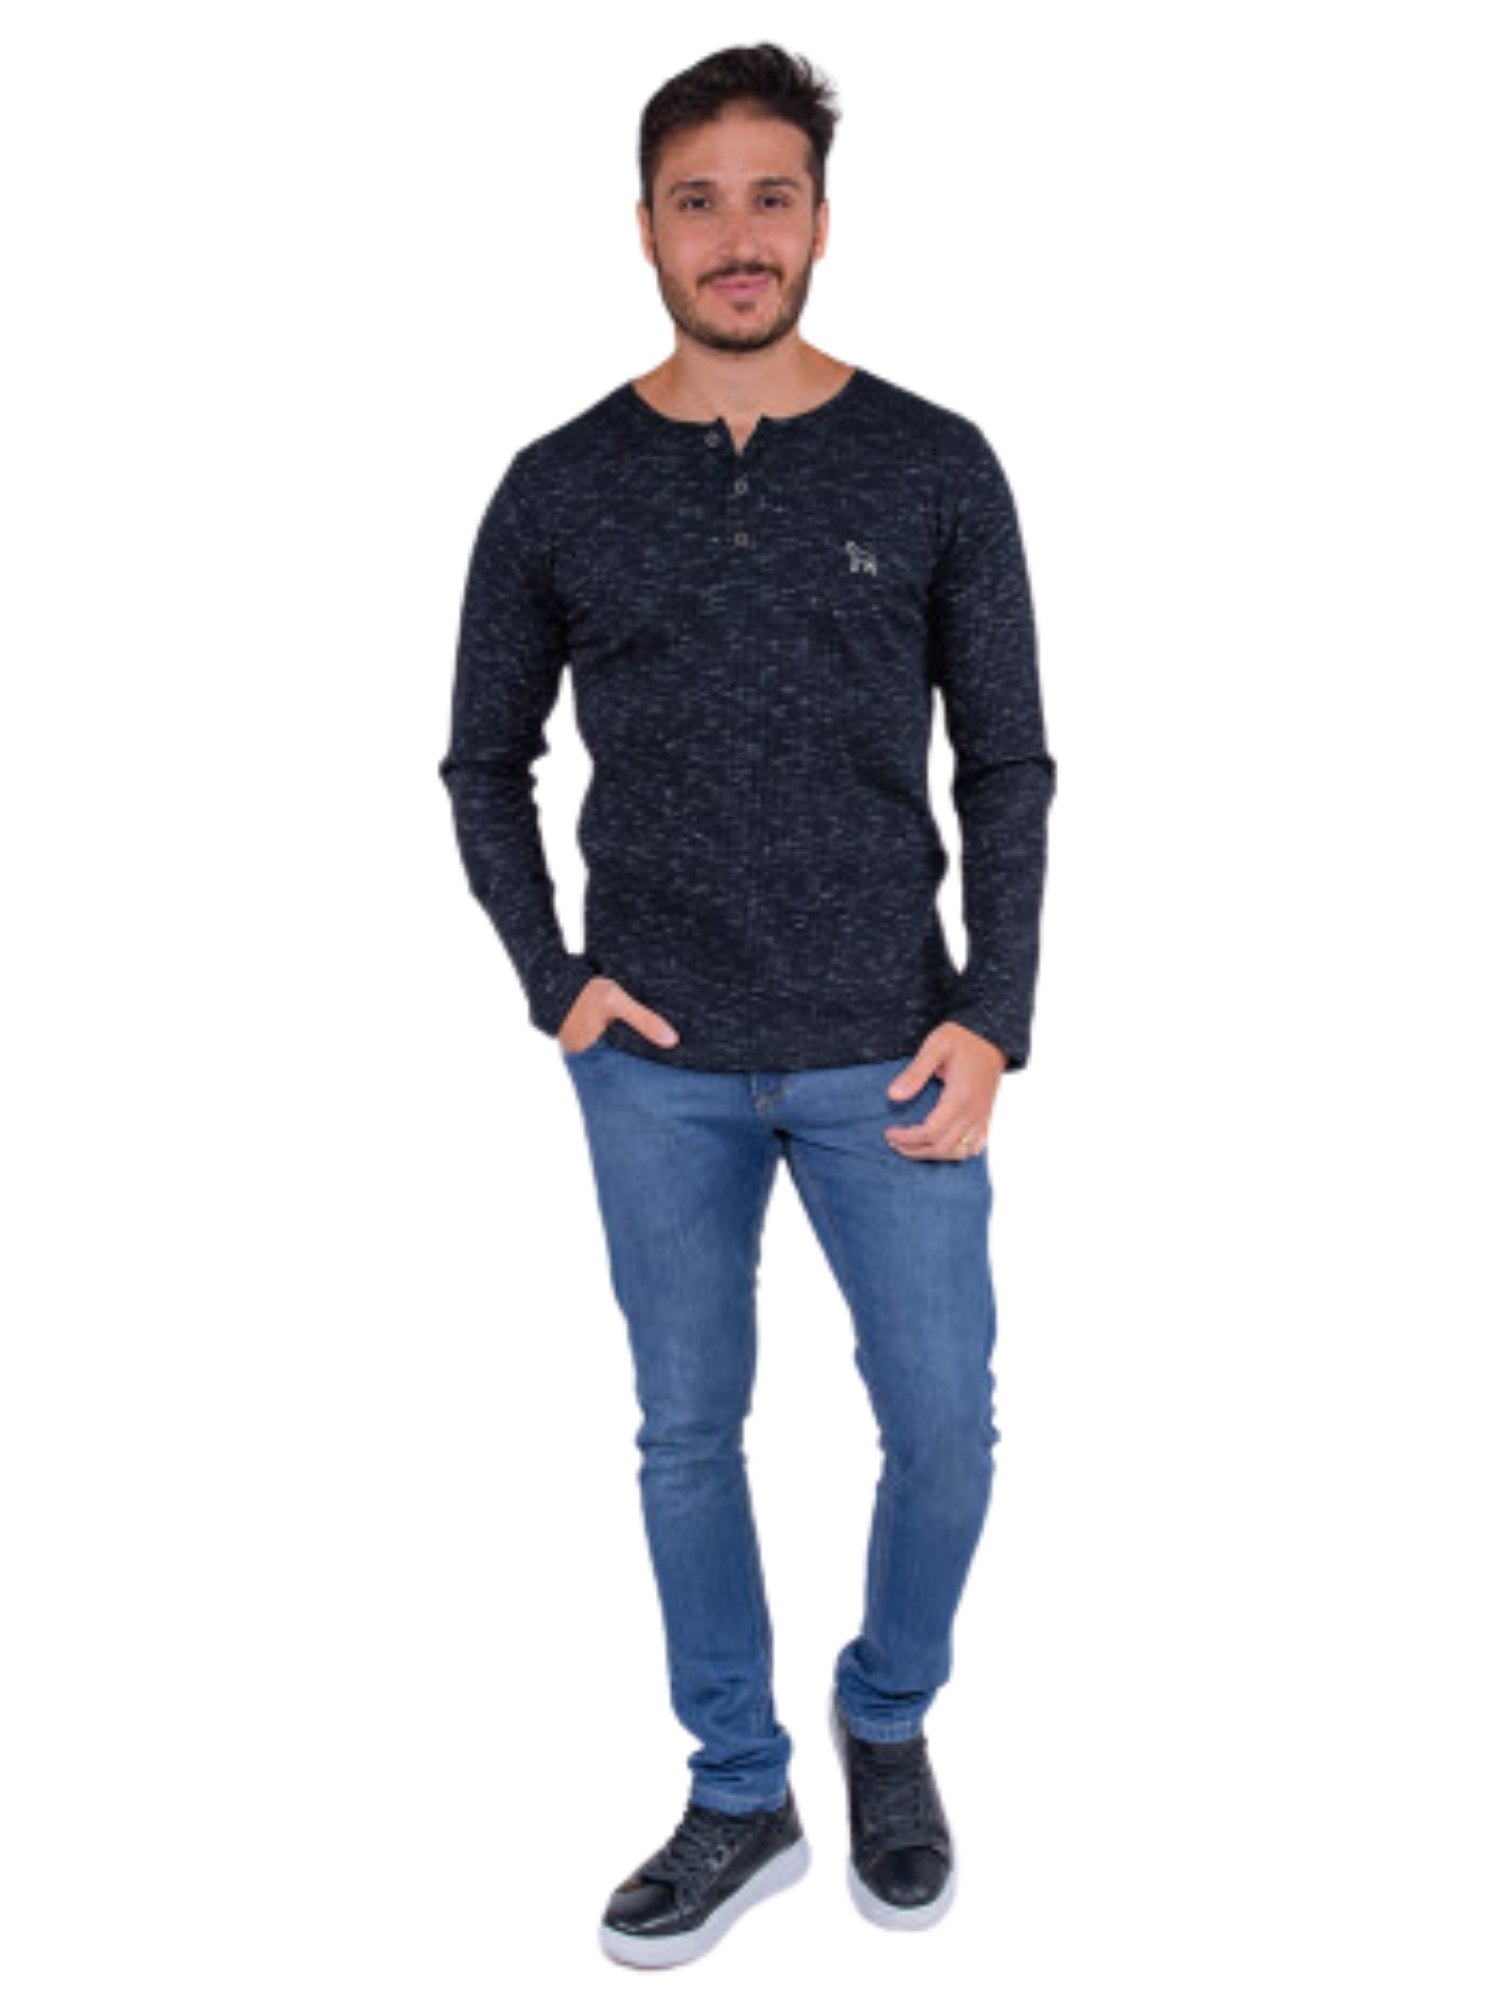 Camiseta Ml Ribana C/Botões Revanche  113418